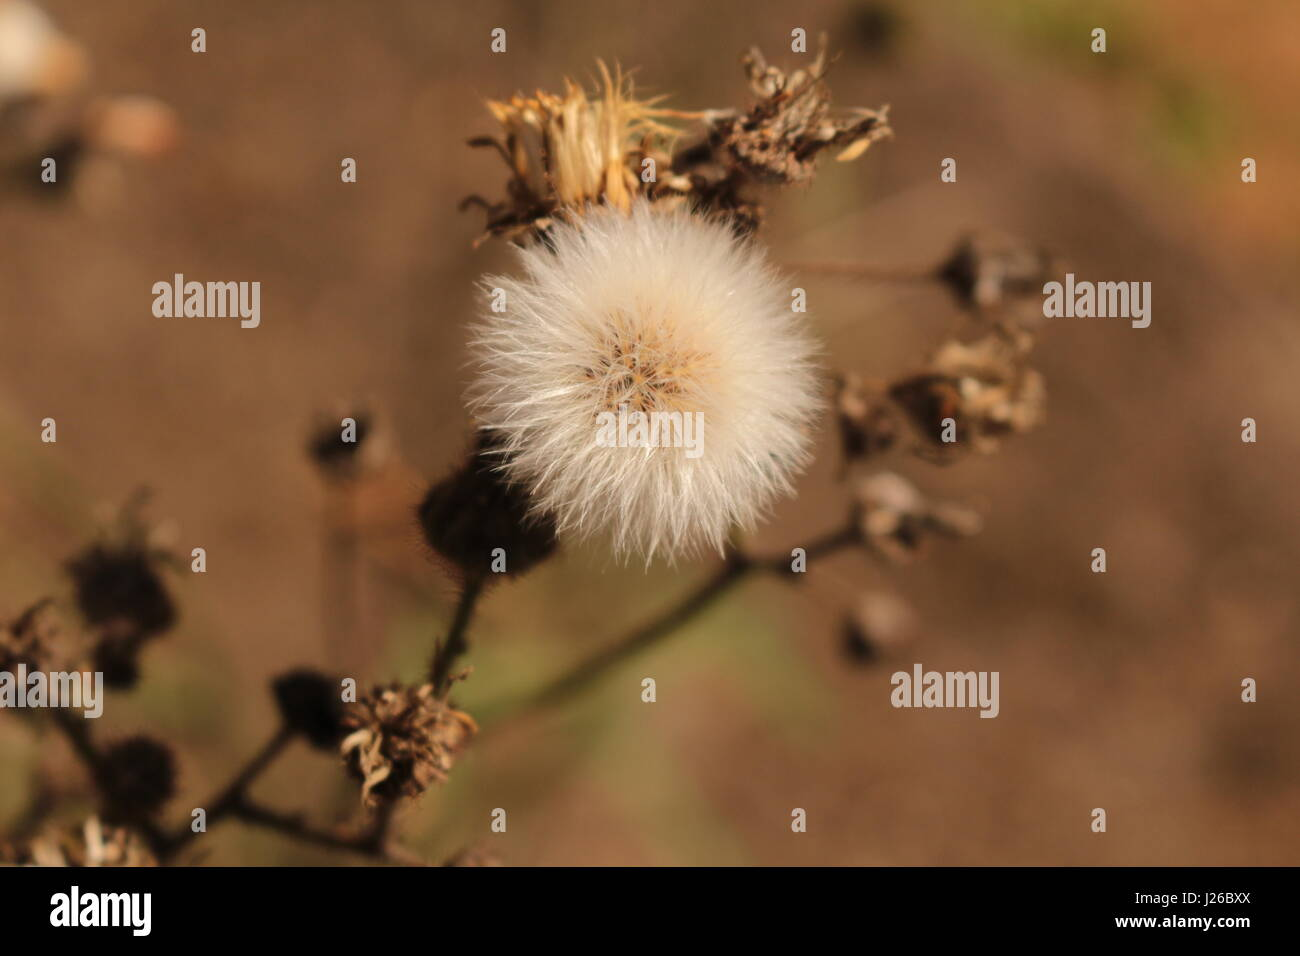 Good Morning Nature Hd Wallpaper Stock Photos Good Morning Nature